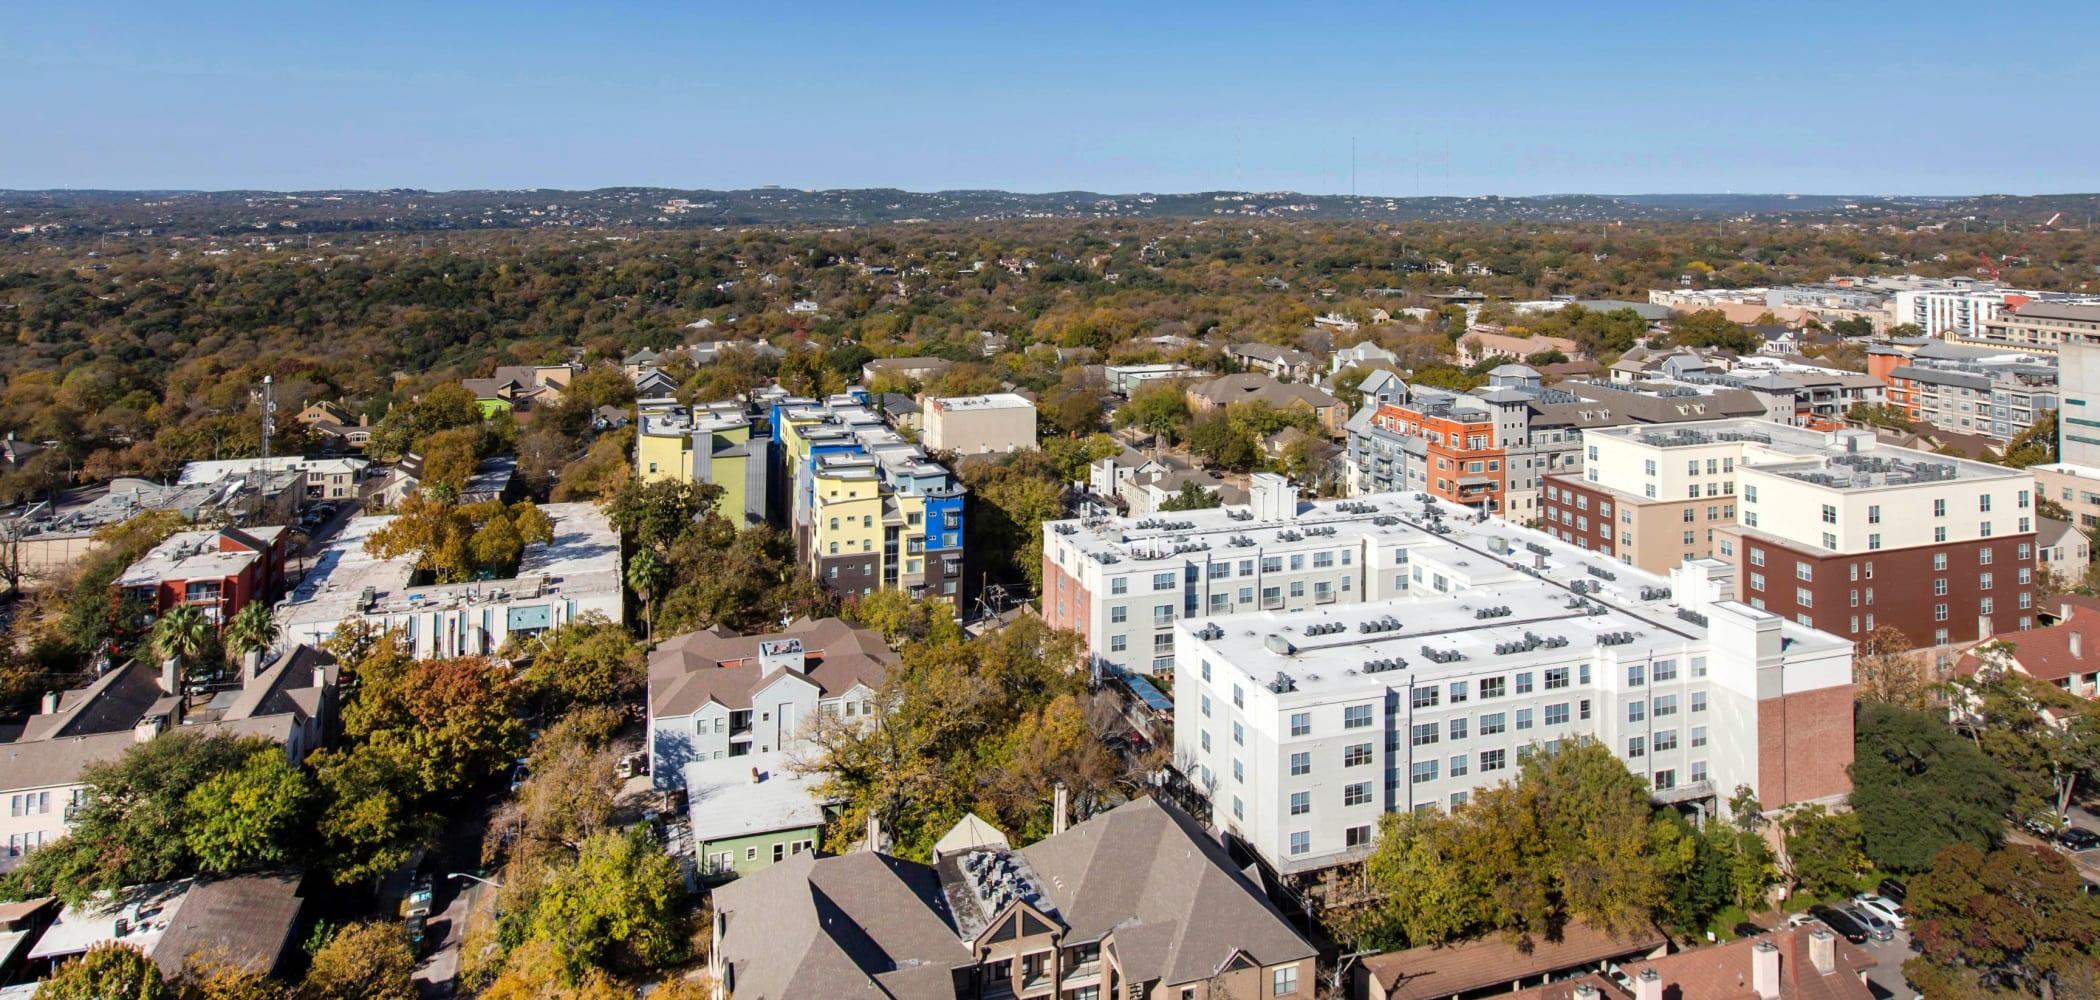 Aerial view of 21 Rio in Austin, Texas